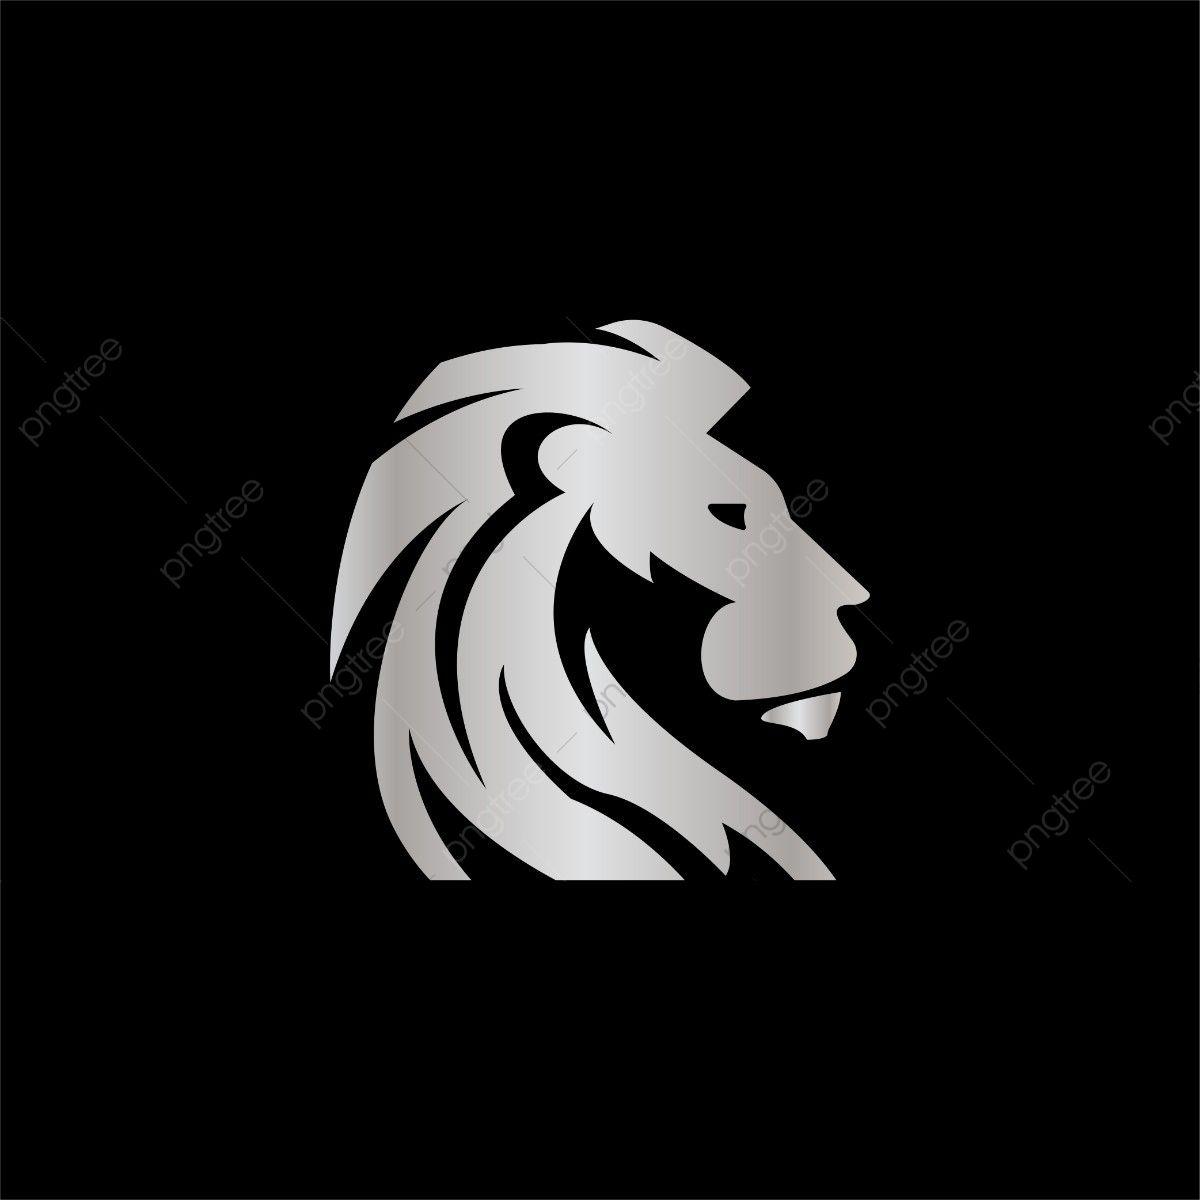 Elegant Silver Lion Crest Vector Design Concept Lion King Lion King Clipart Lion Icons King Icons Png And Vector With Transparent Background For Free Downloa Vector Design Lion Icon Concept Design